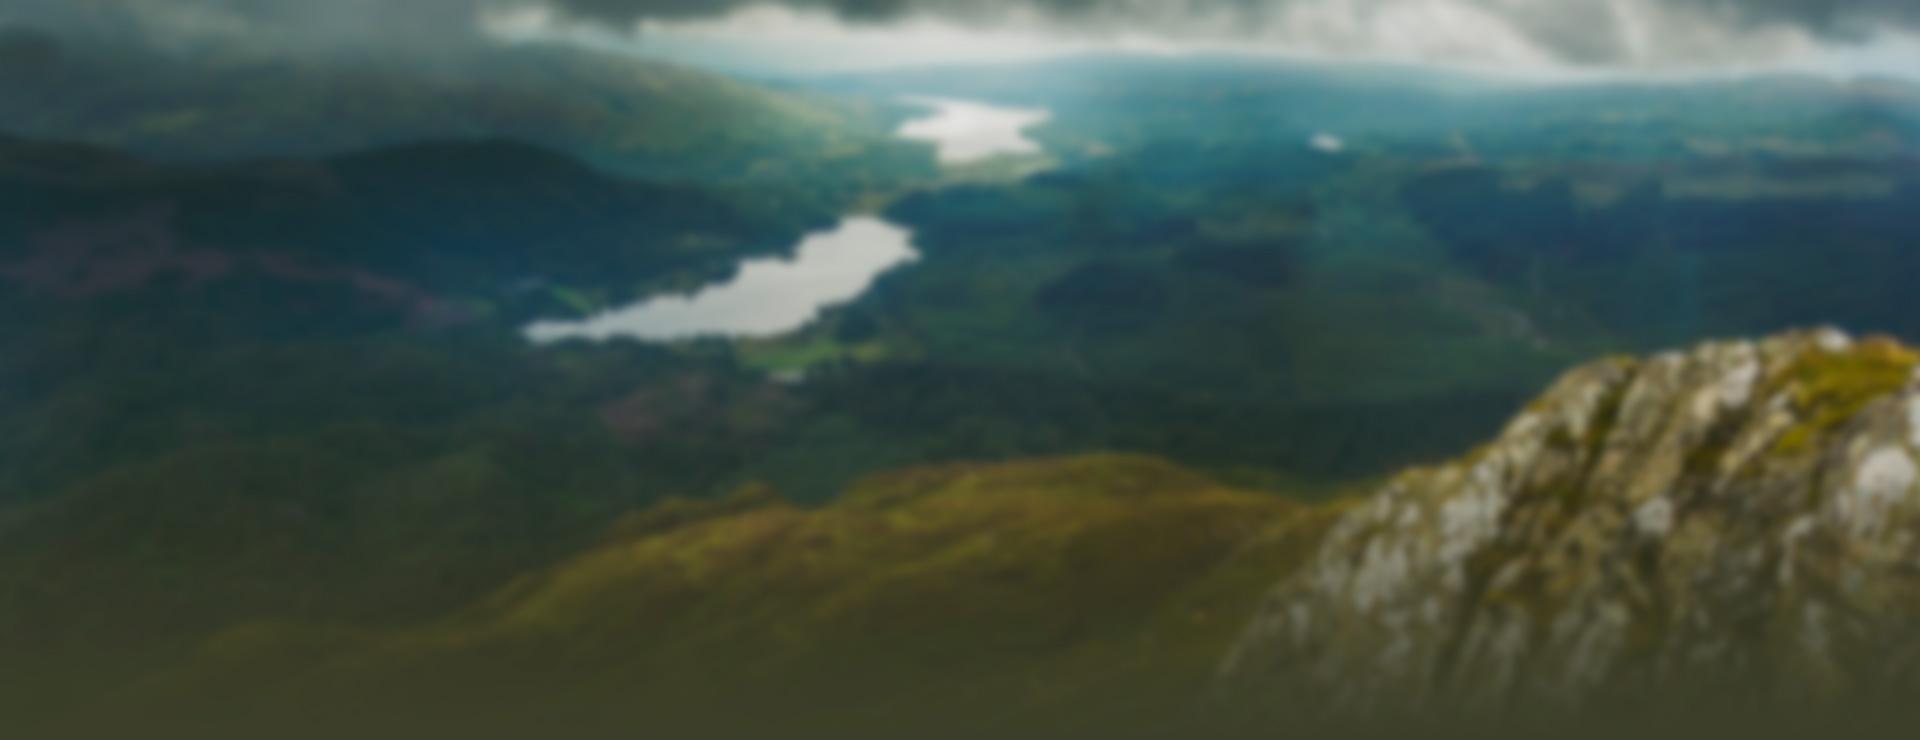 Camping Slider Background 2 Blur